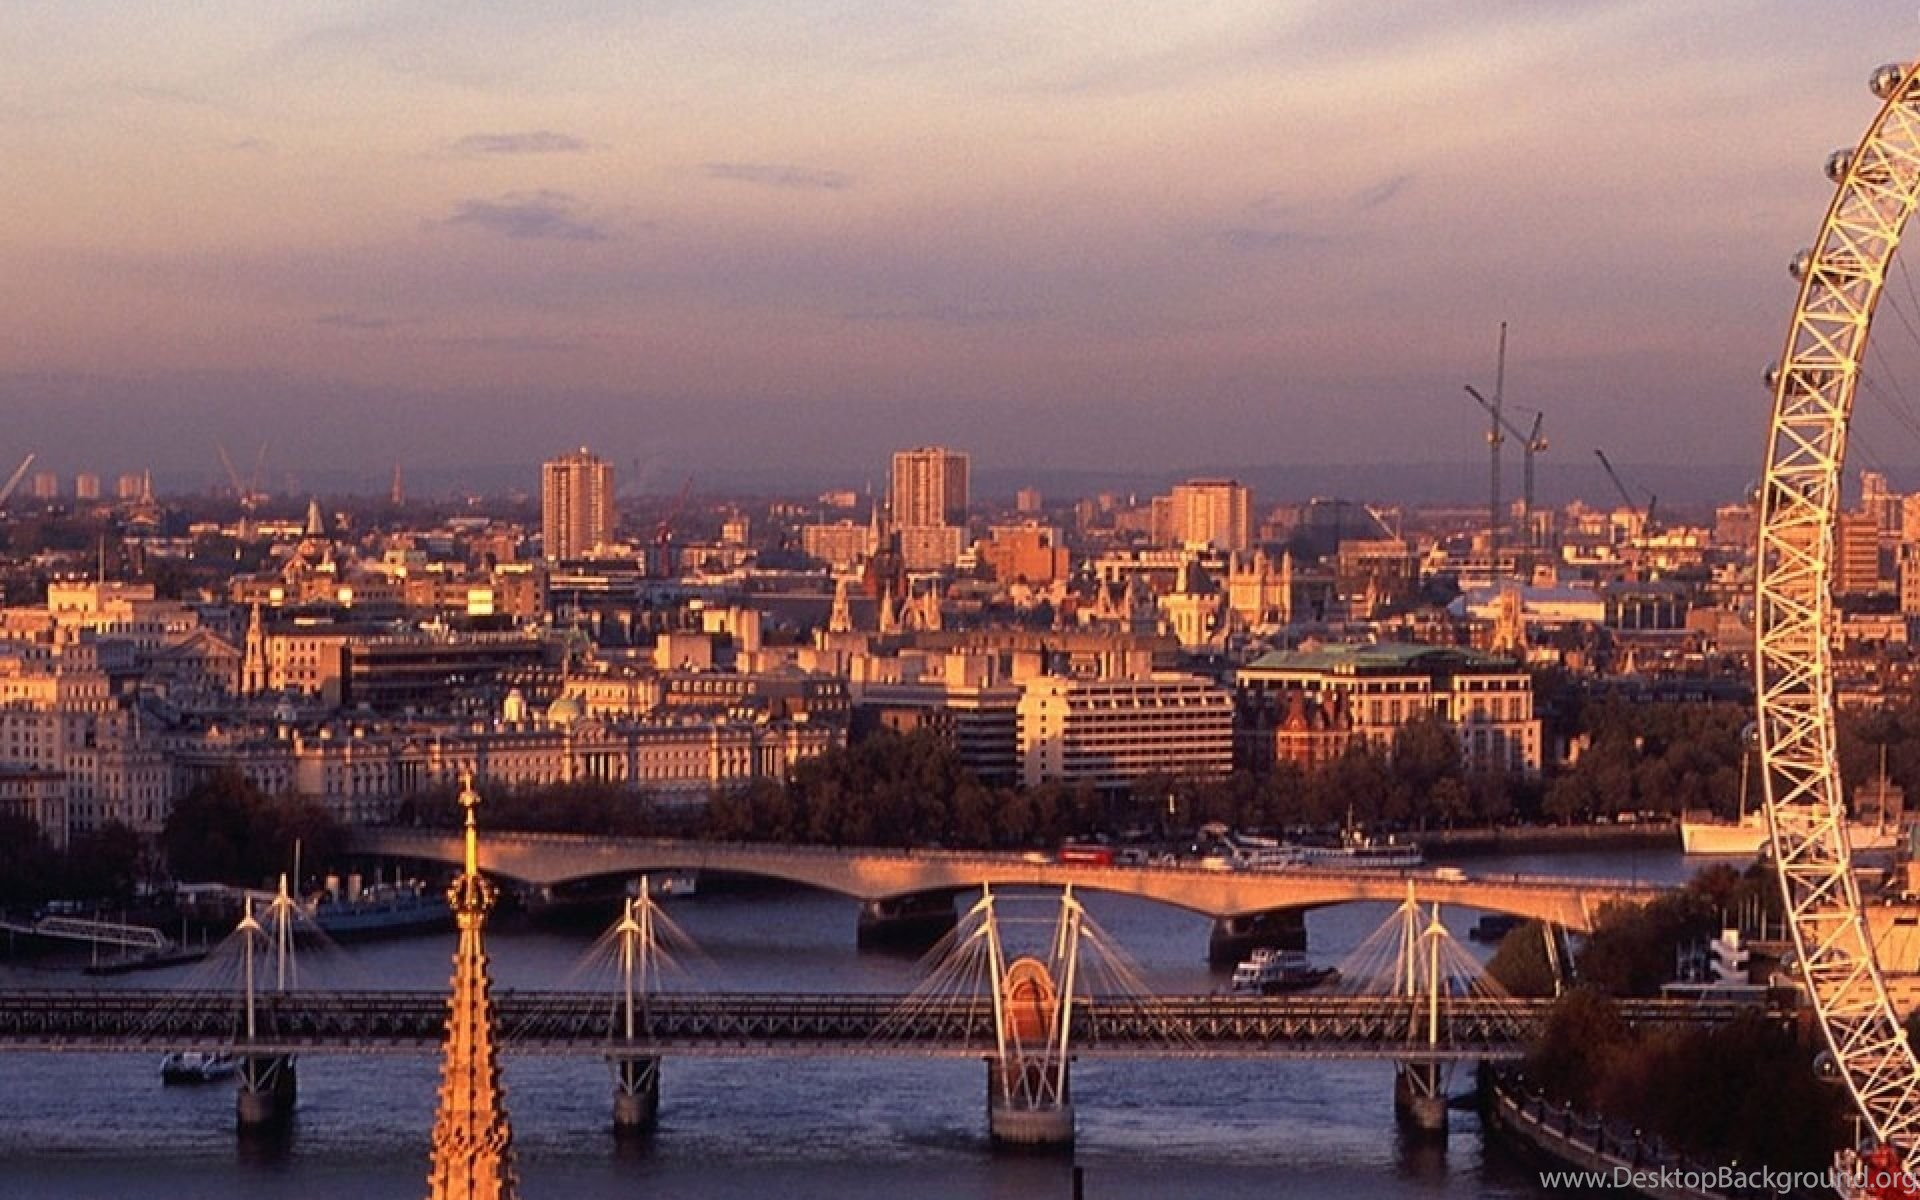 download wallpapers 3840x1200 london, england, river, bridge, big